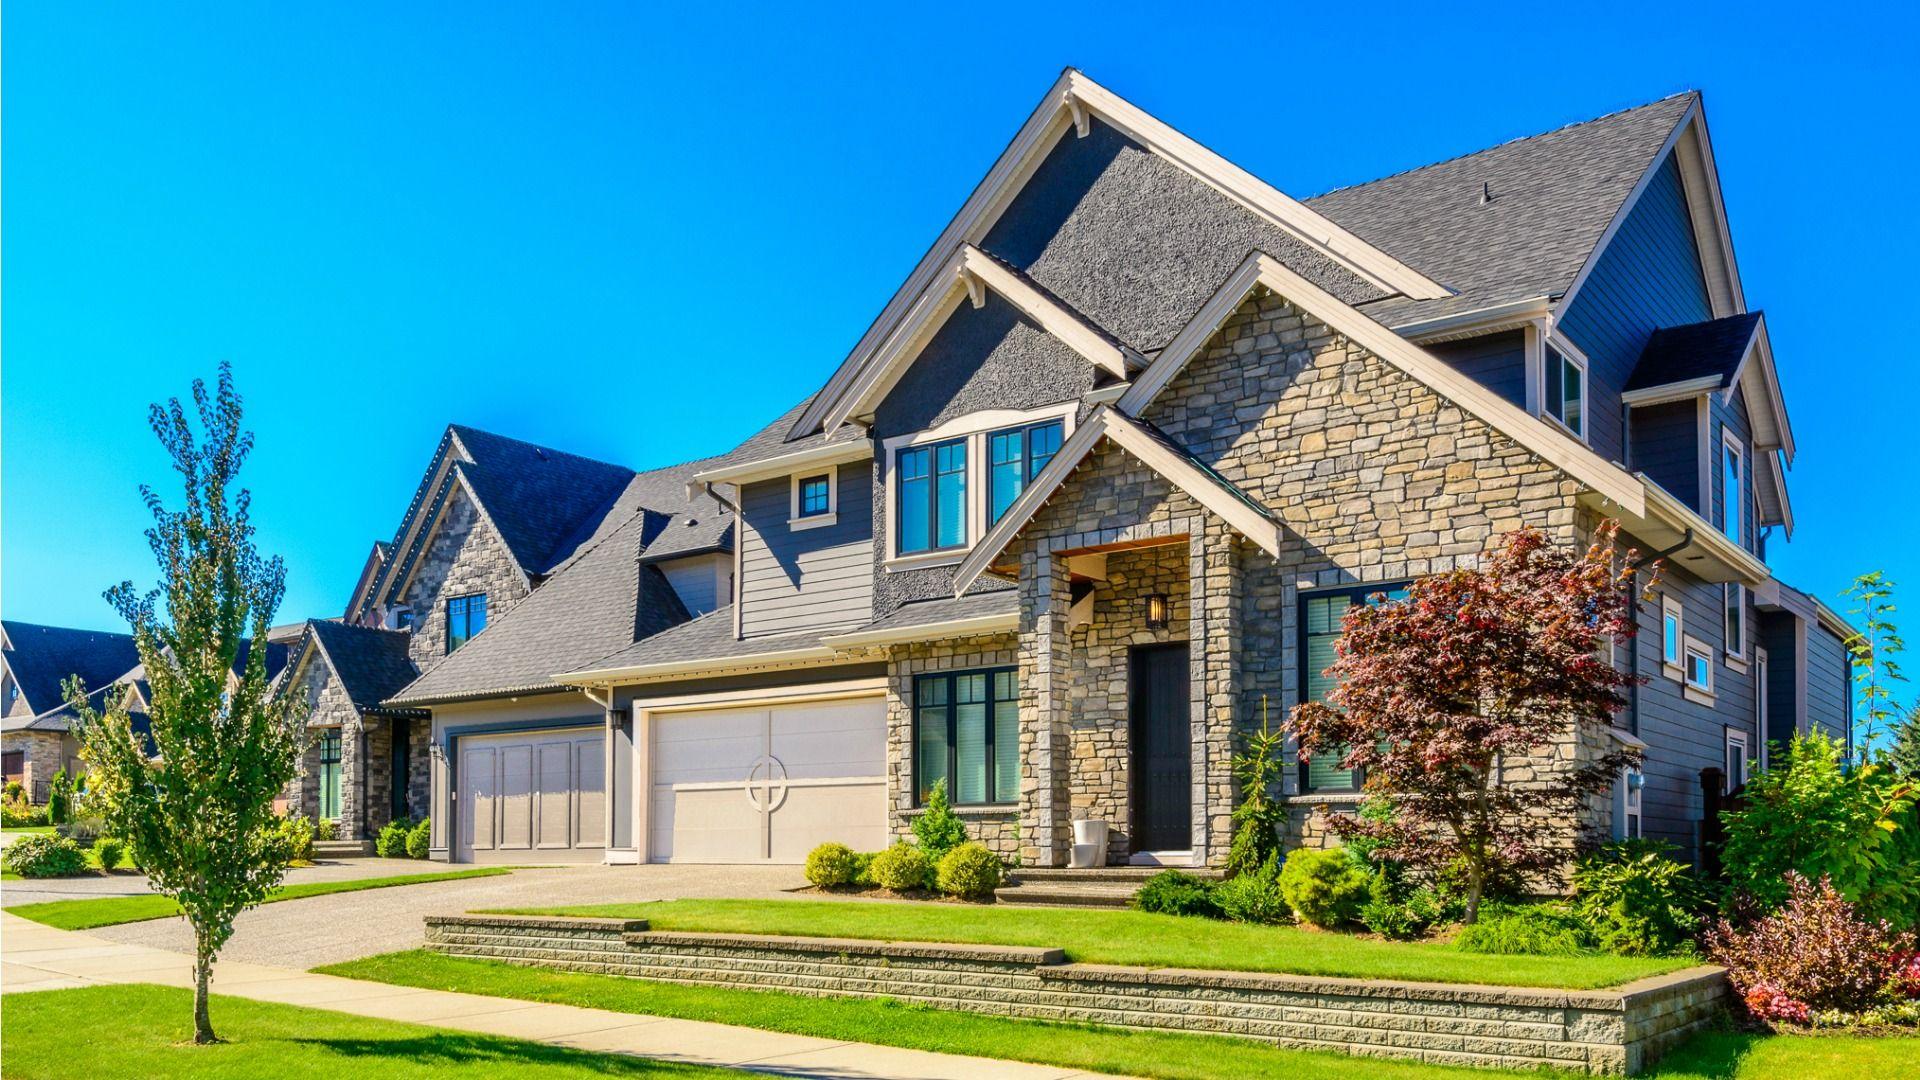 Highlands Homes For Sale Edina Mn Josh Sprague Roof